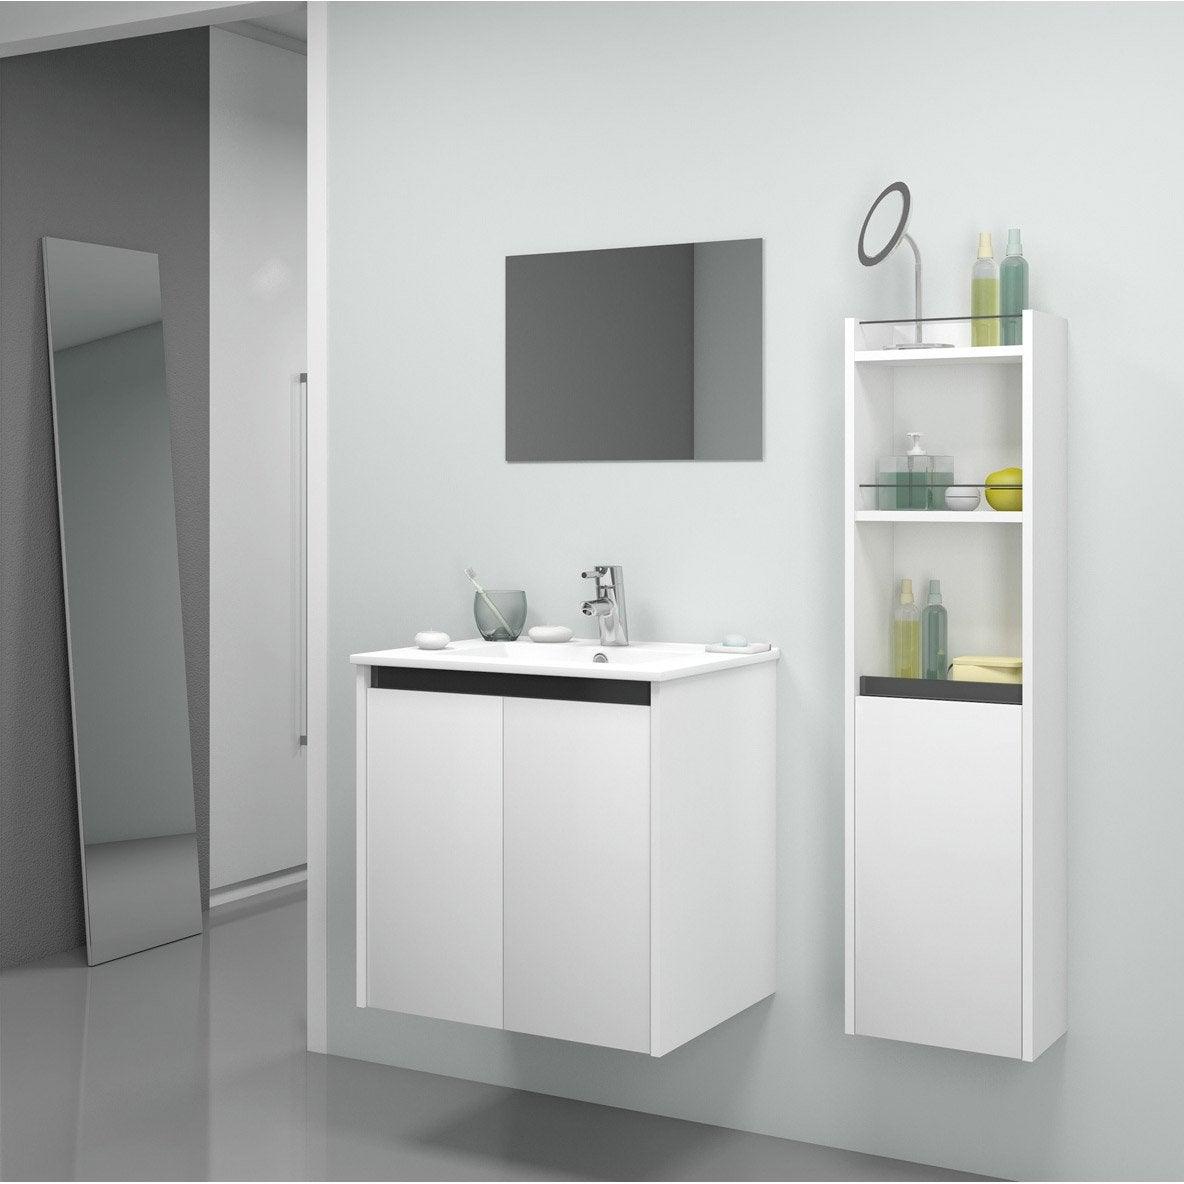 Meuble de salle de bains first blanc 61x46 cm 2 portes leroy merlin - Leroy merlin meubles ...